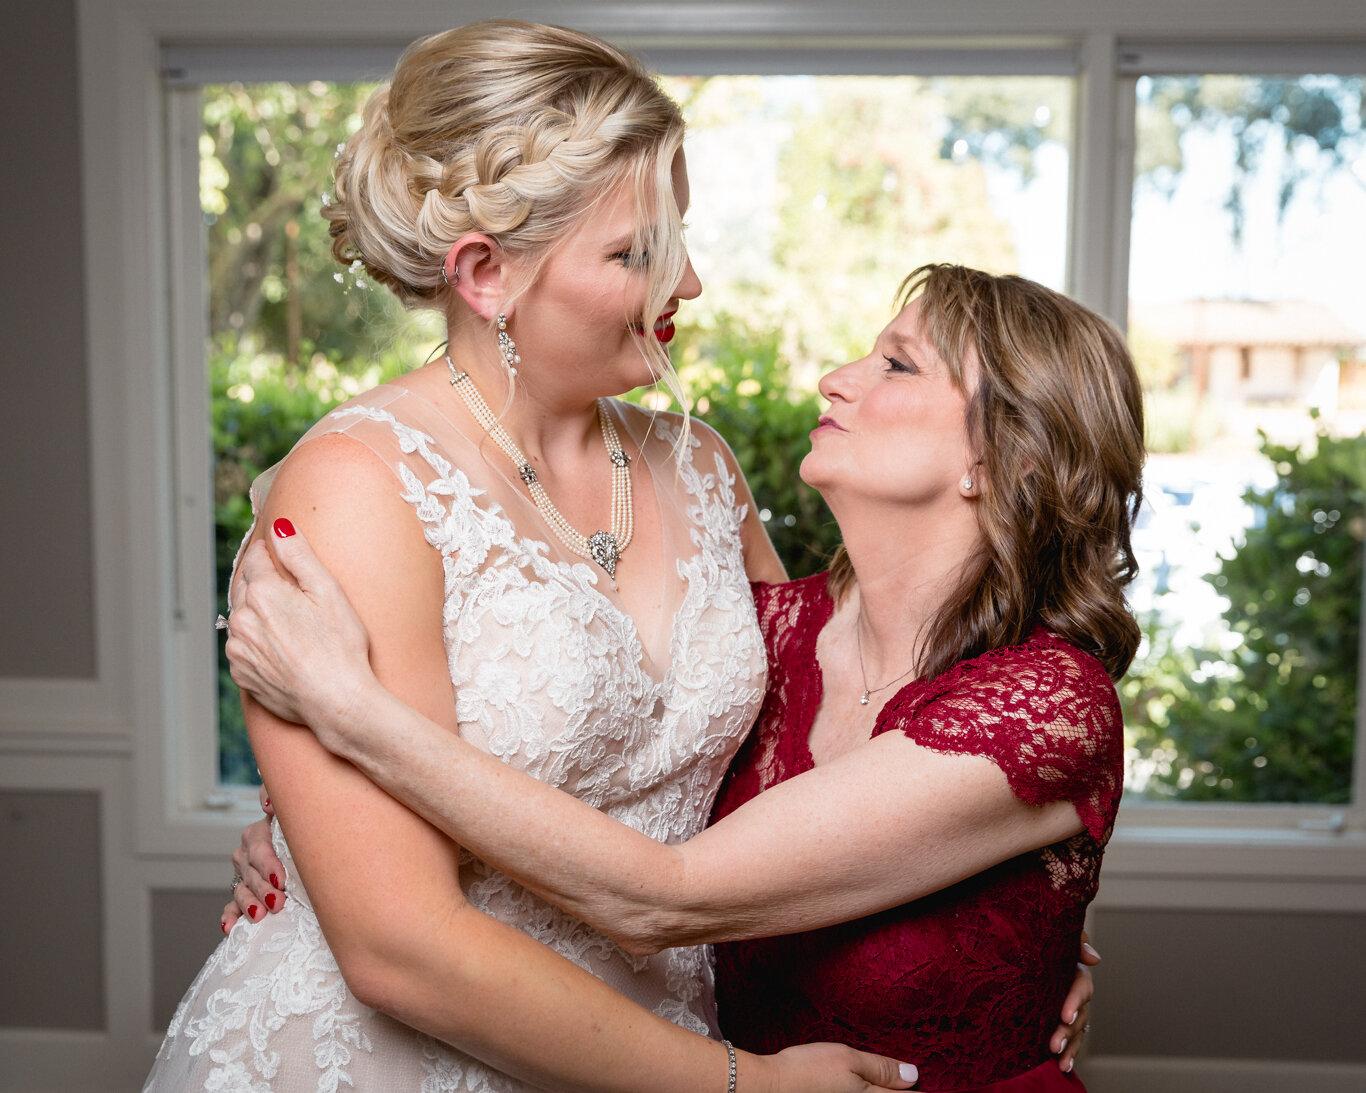 2019.08.24_Emily-Ashir-Wedding-at-the-Maples-5234.jpg